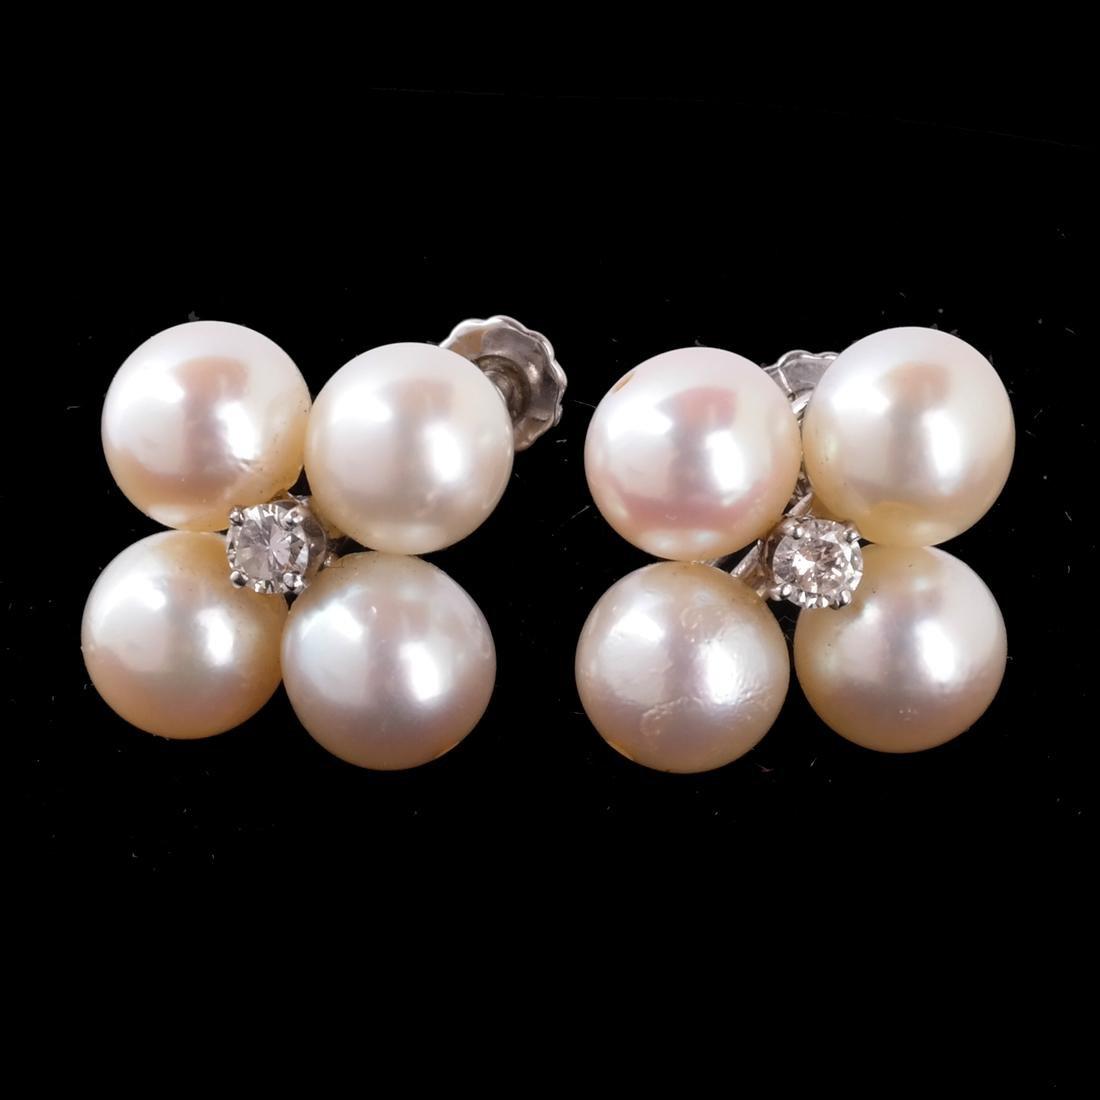 14k WG 9mm Cultured Pearl Earrings